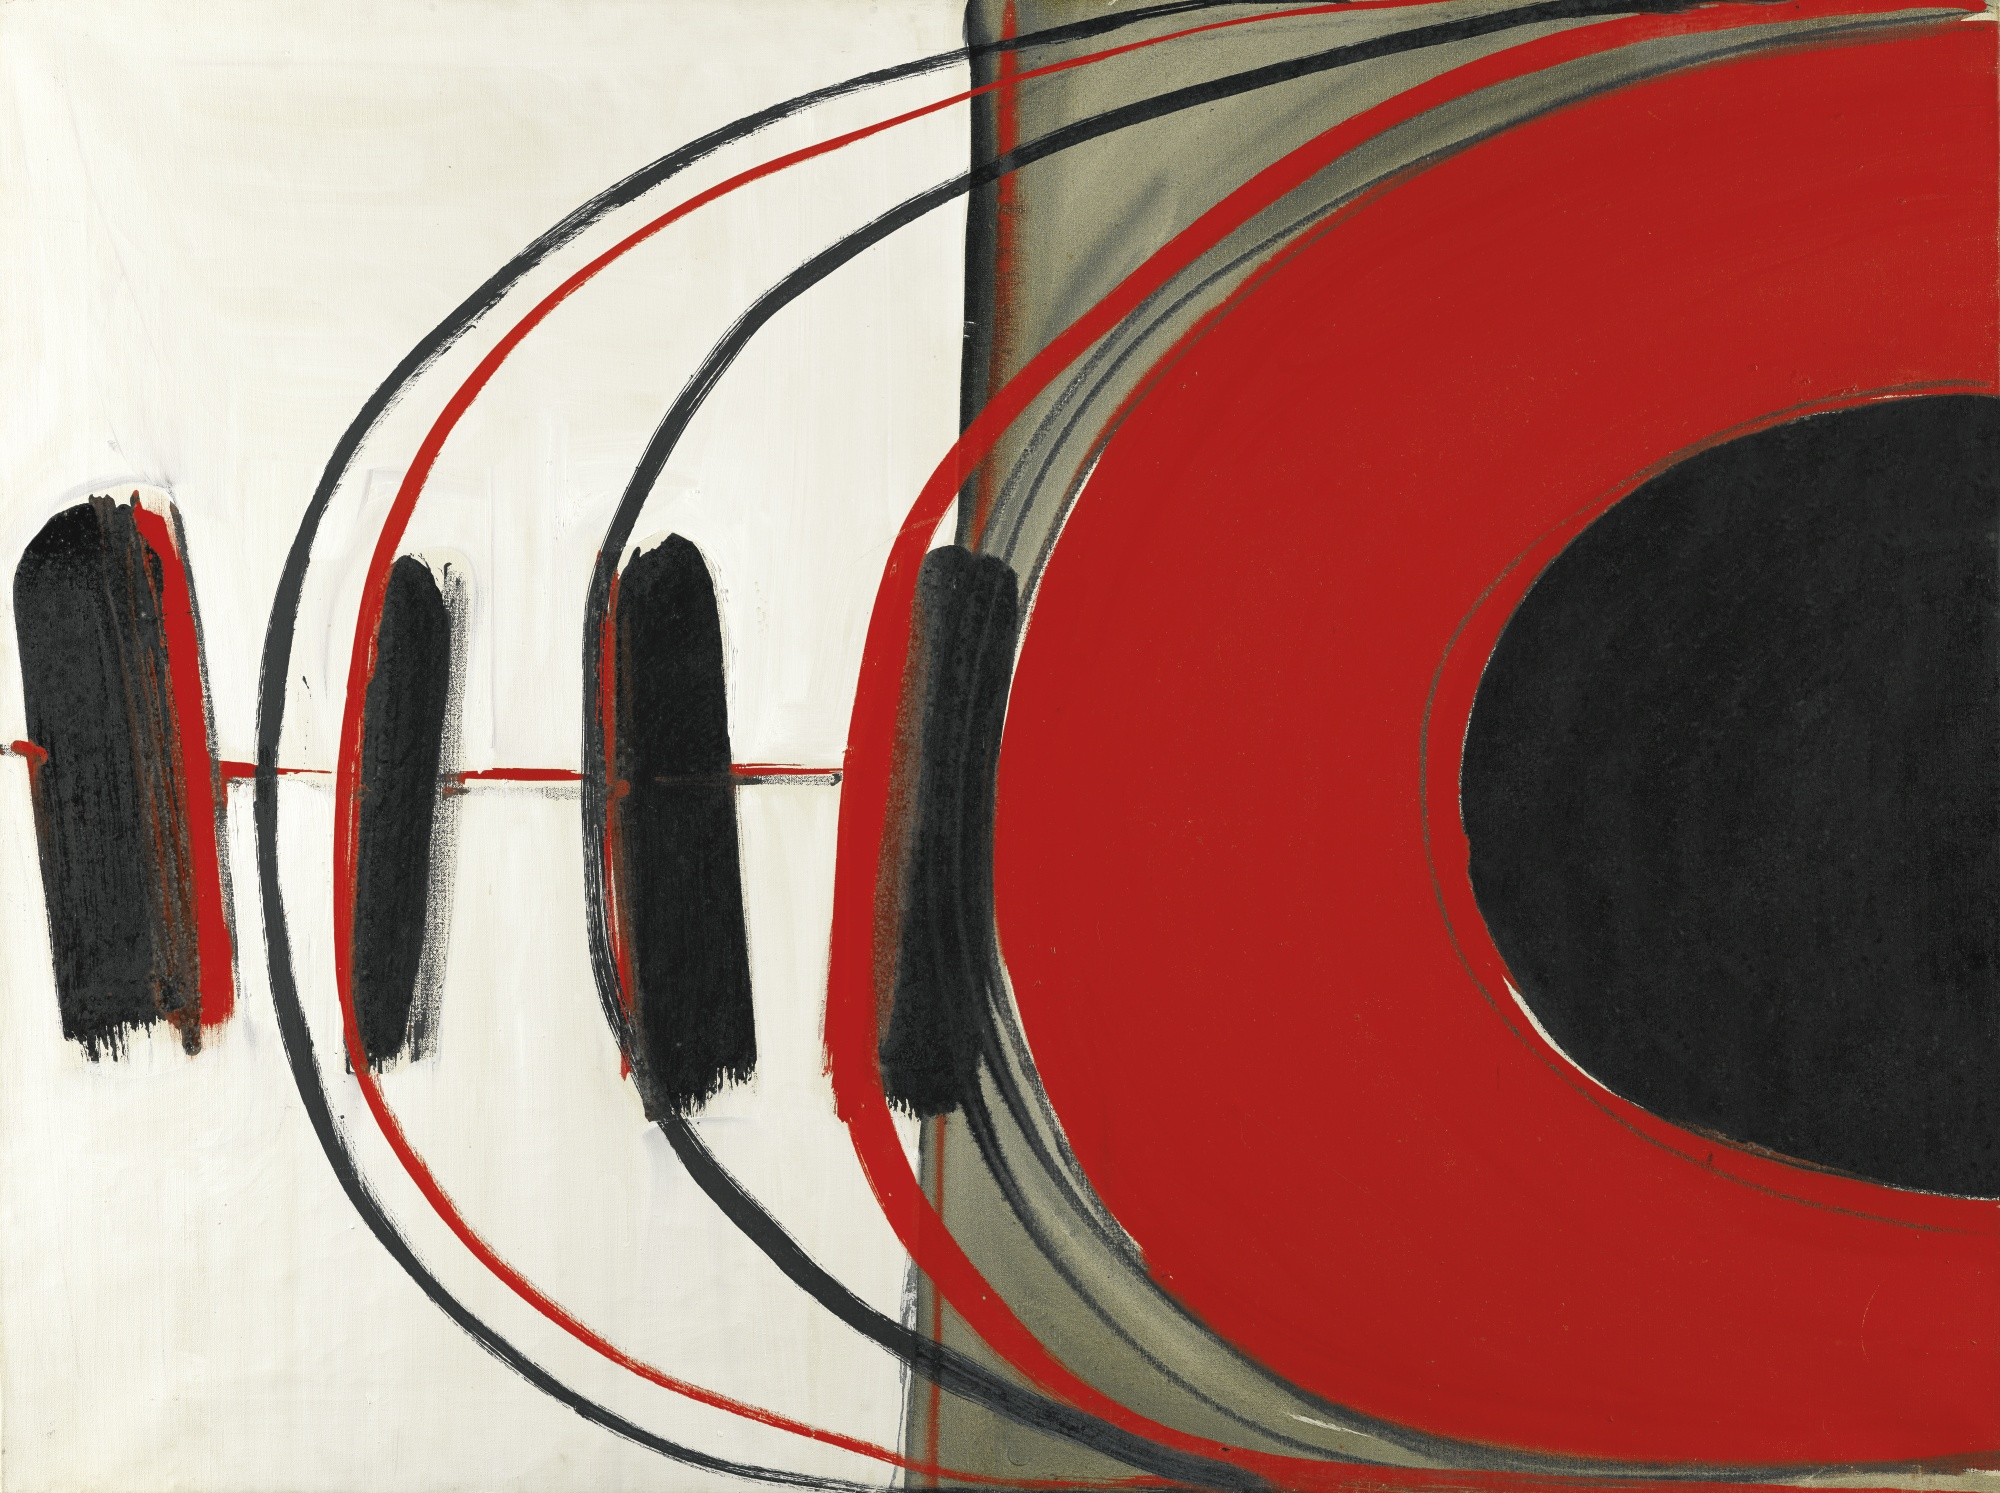 Terry Frost-Red, Black Verticals-1962